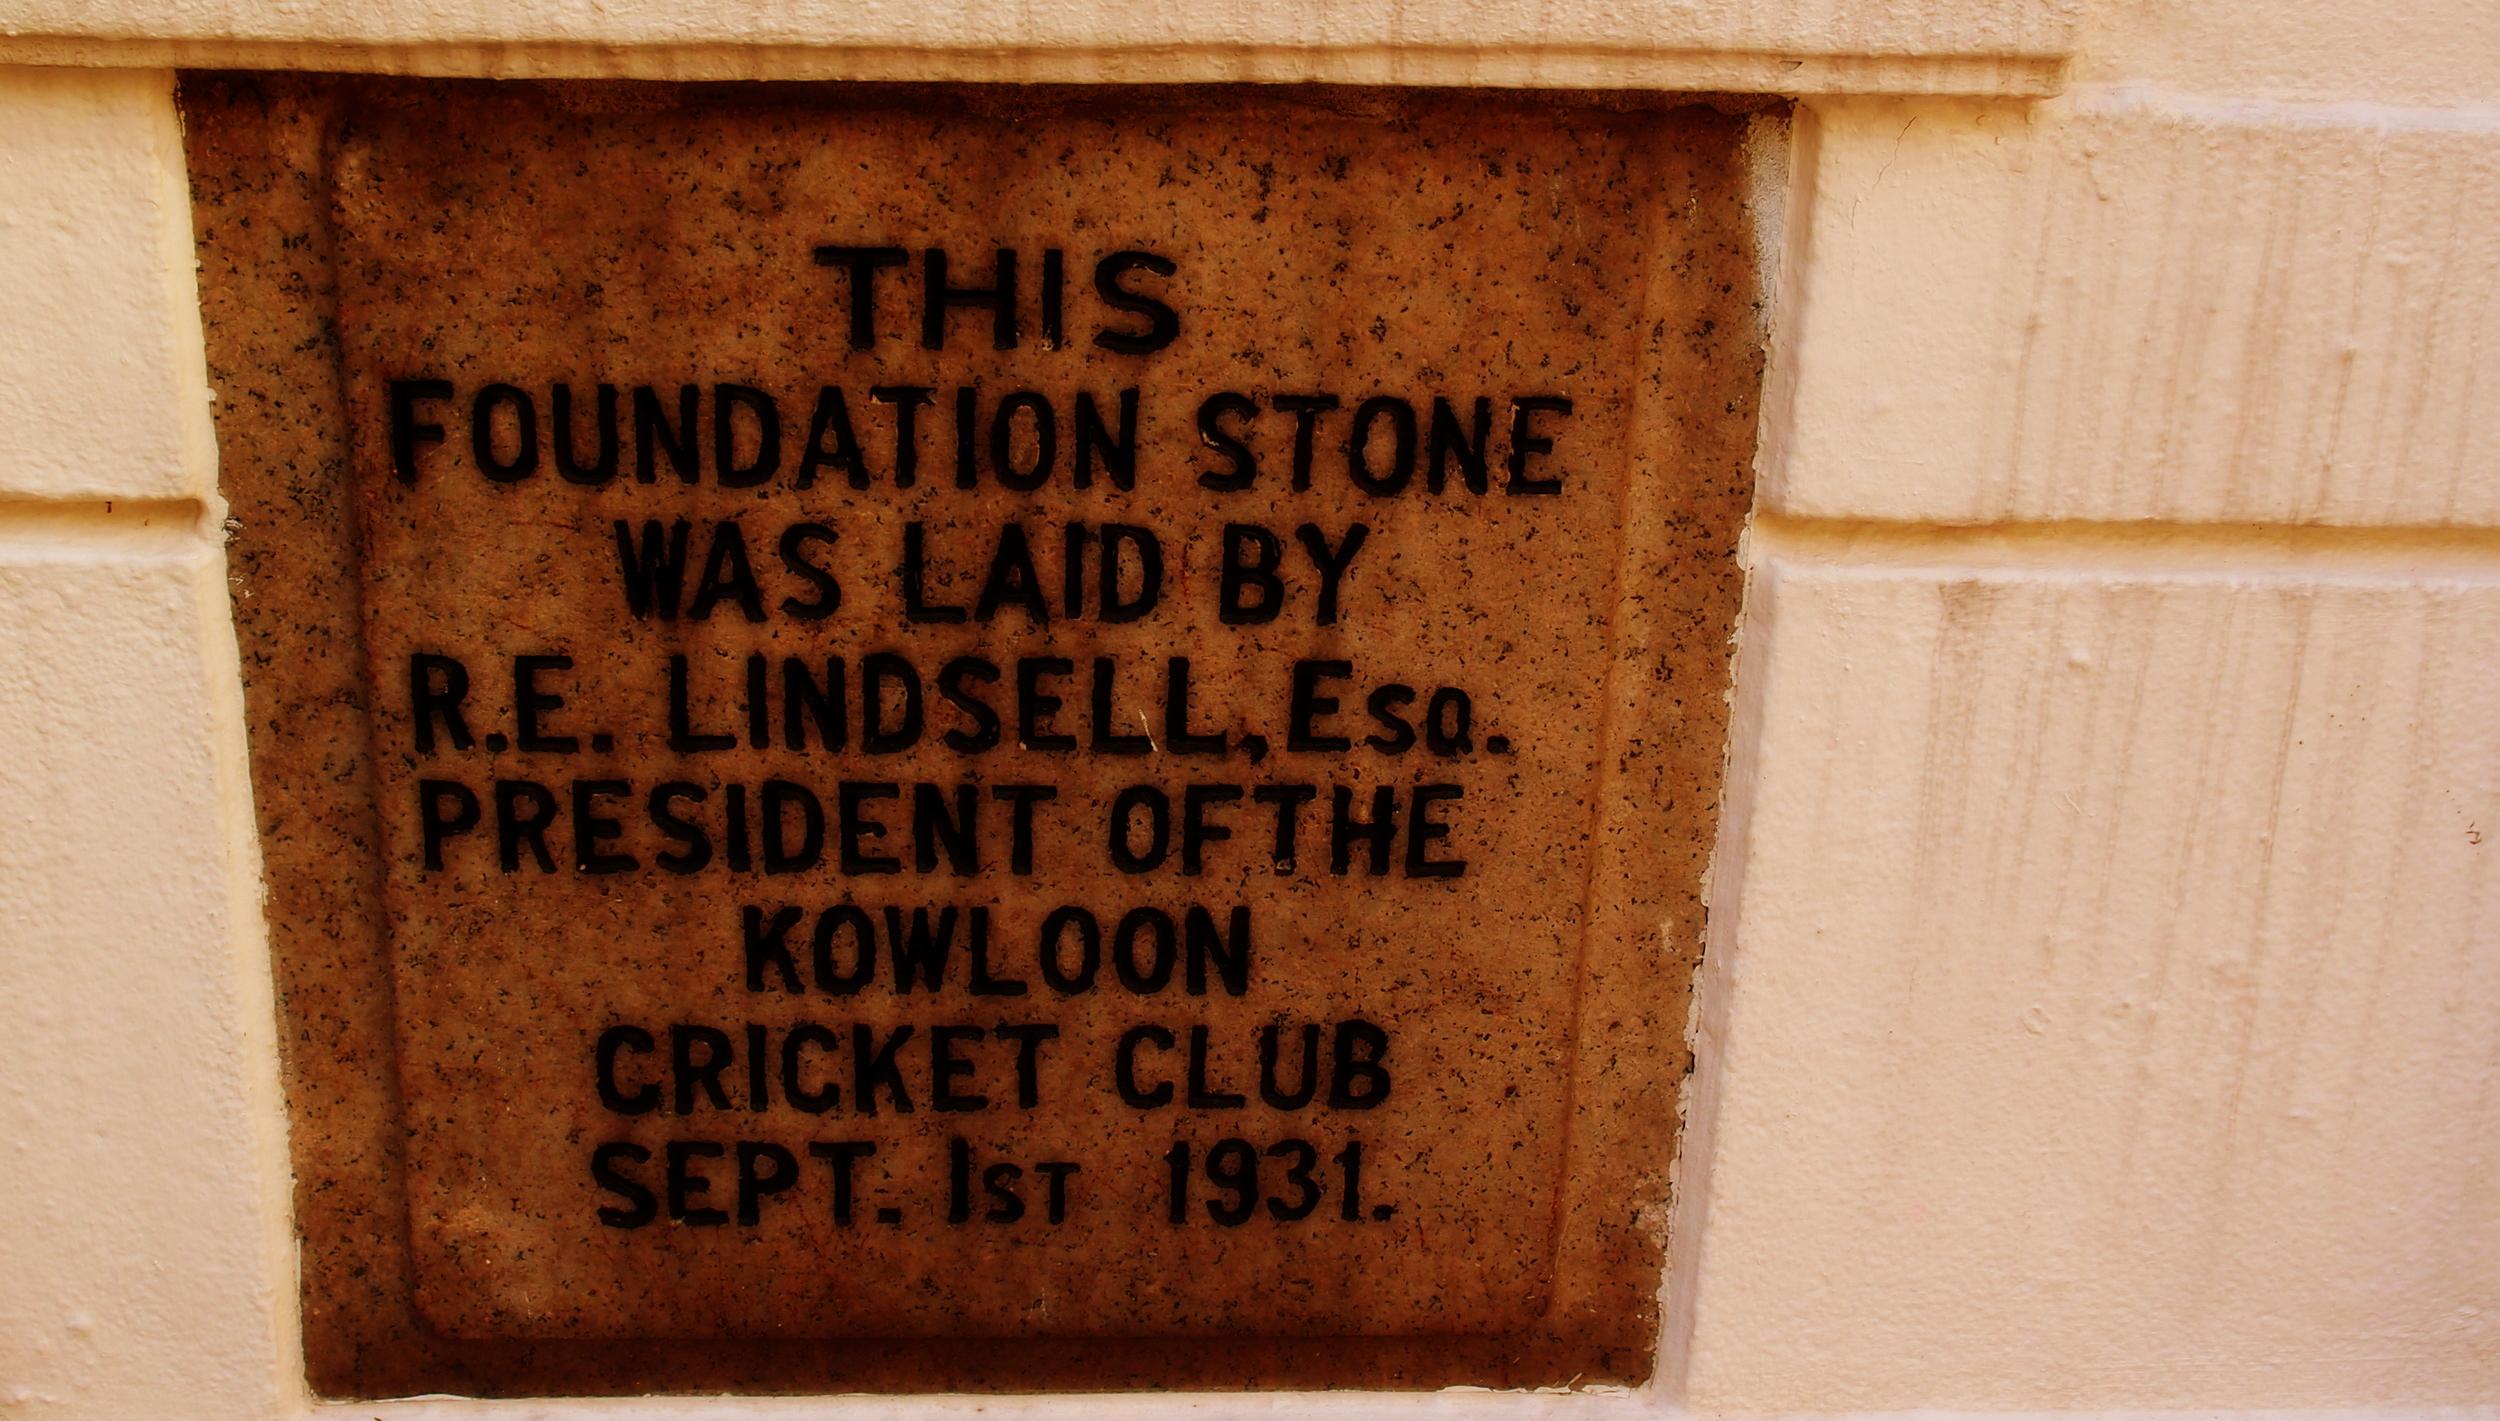 The legendary Kowloon Cricket Club